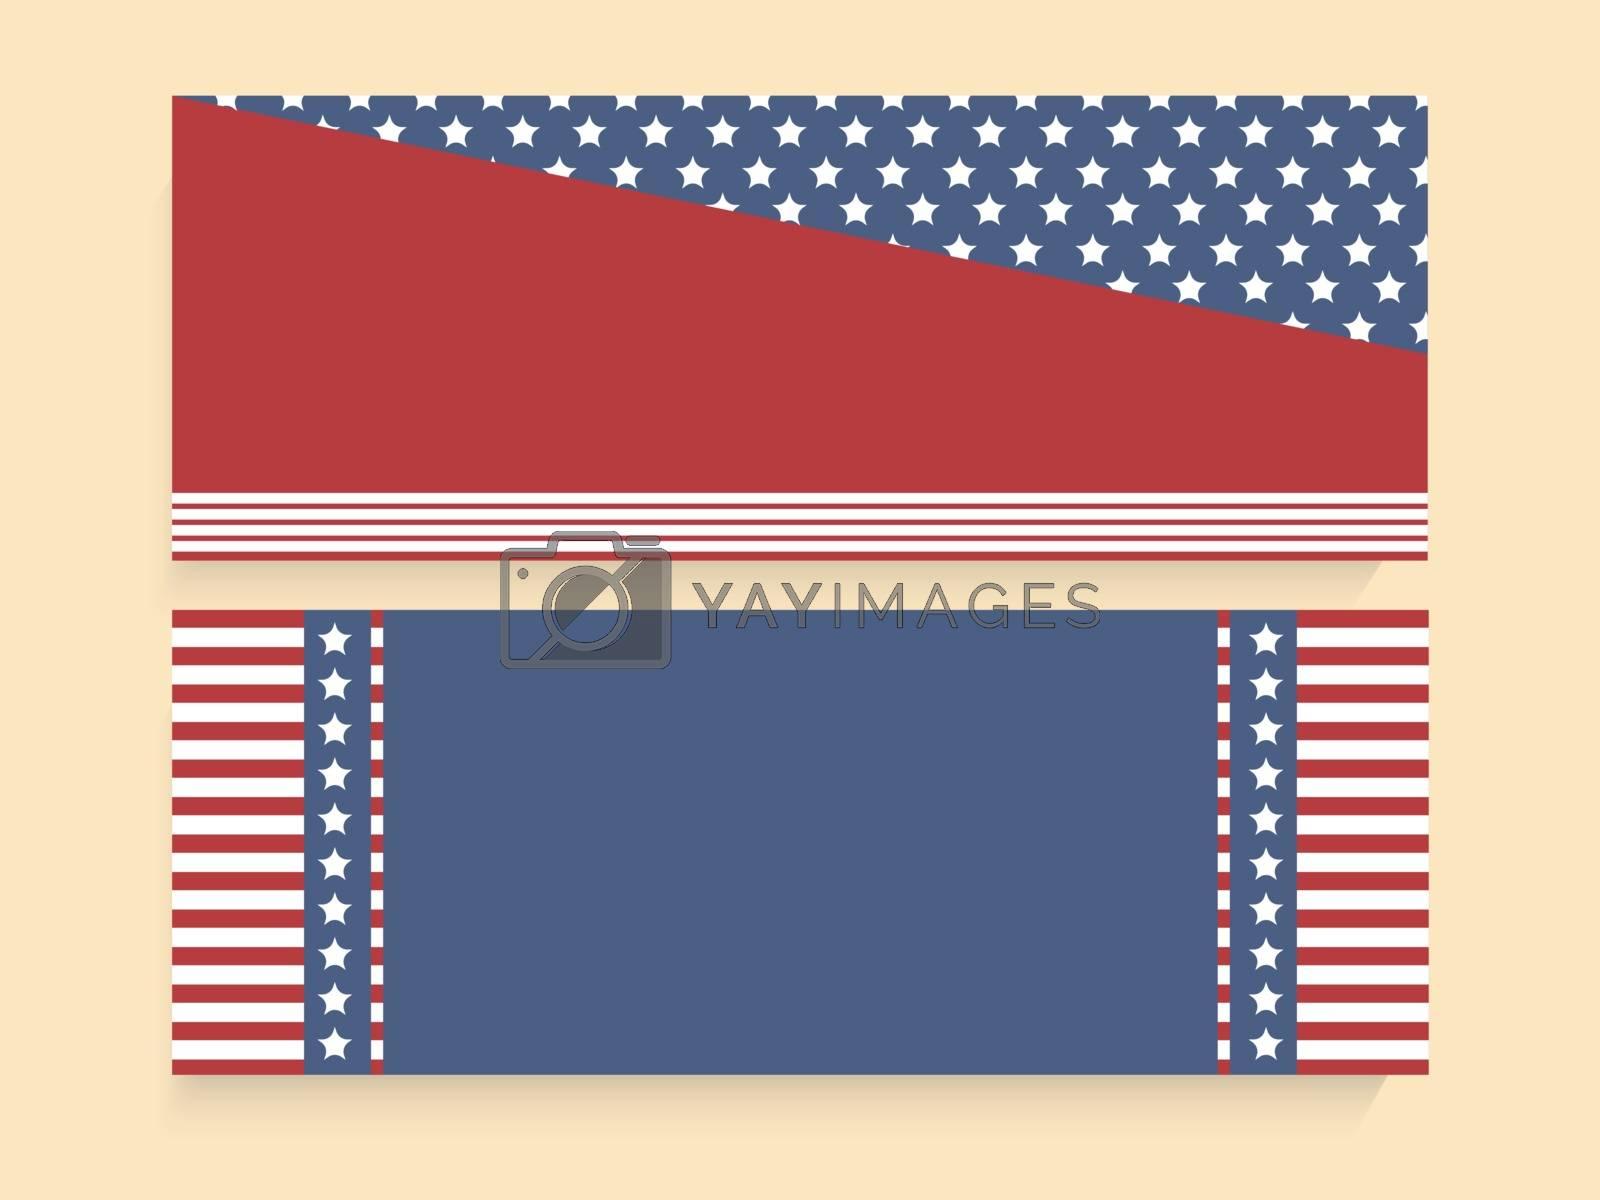 American Flag colors website header or banner set for 4th of July, Independence Day celebration.